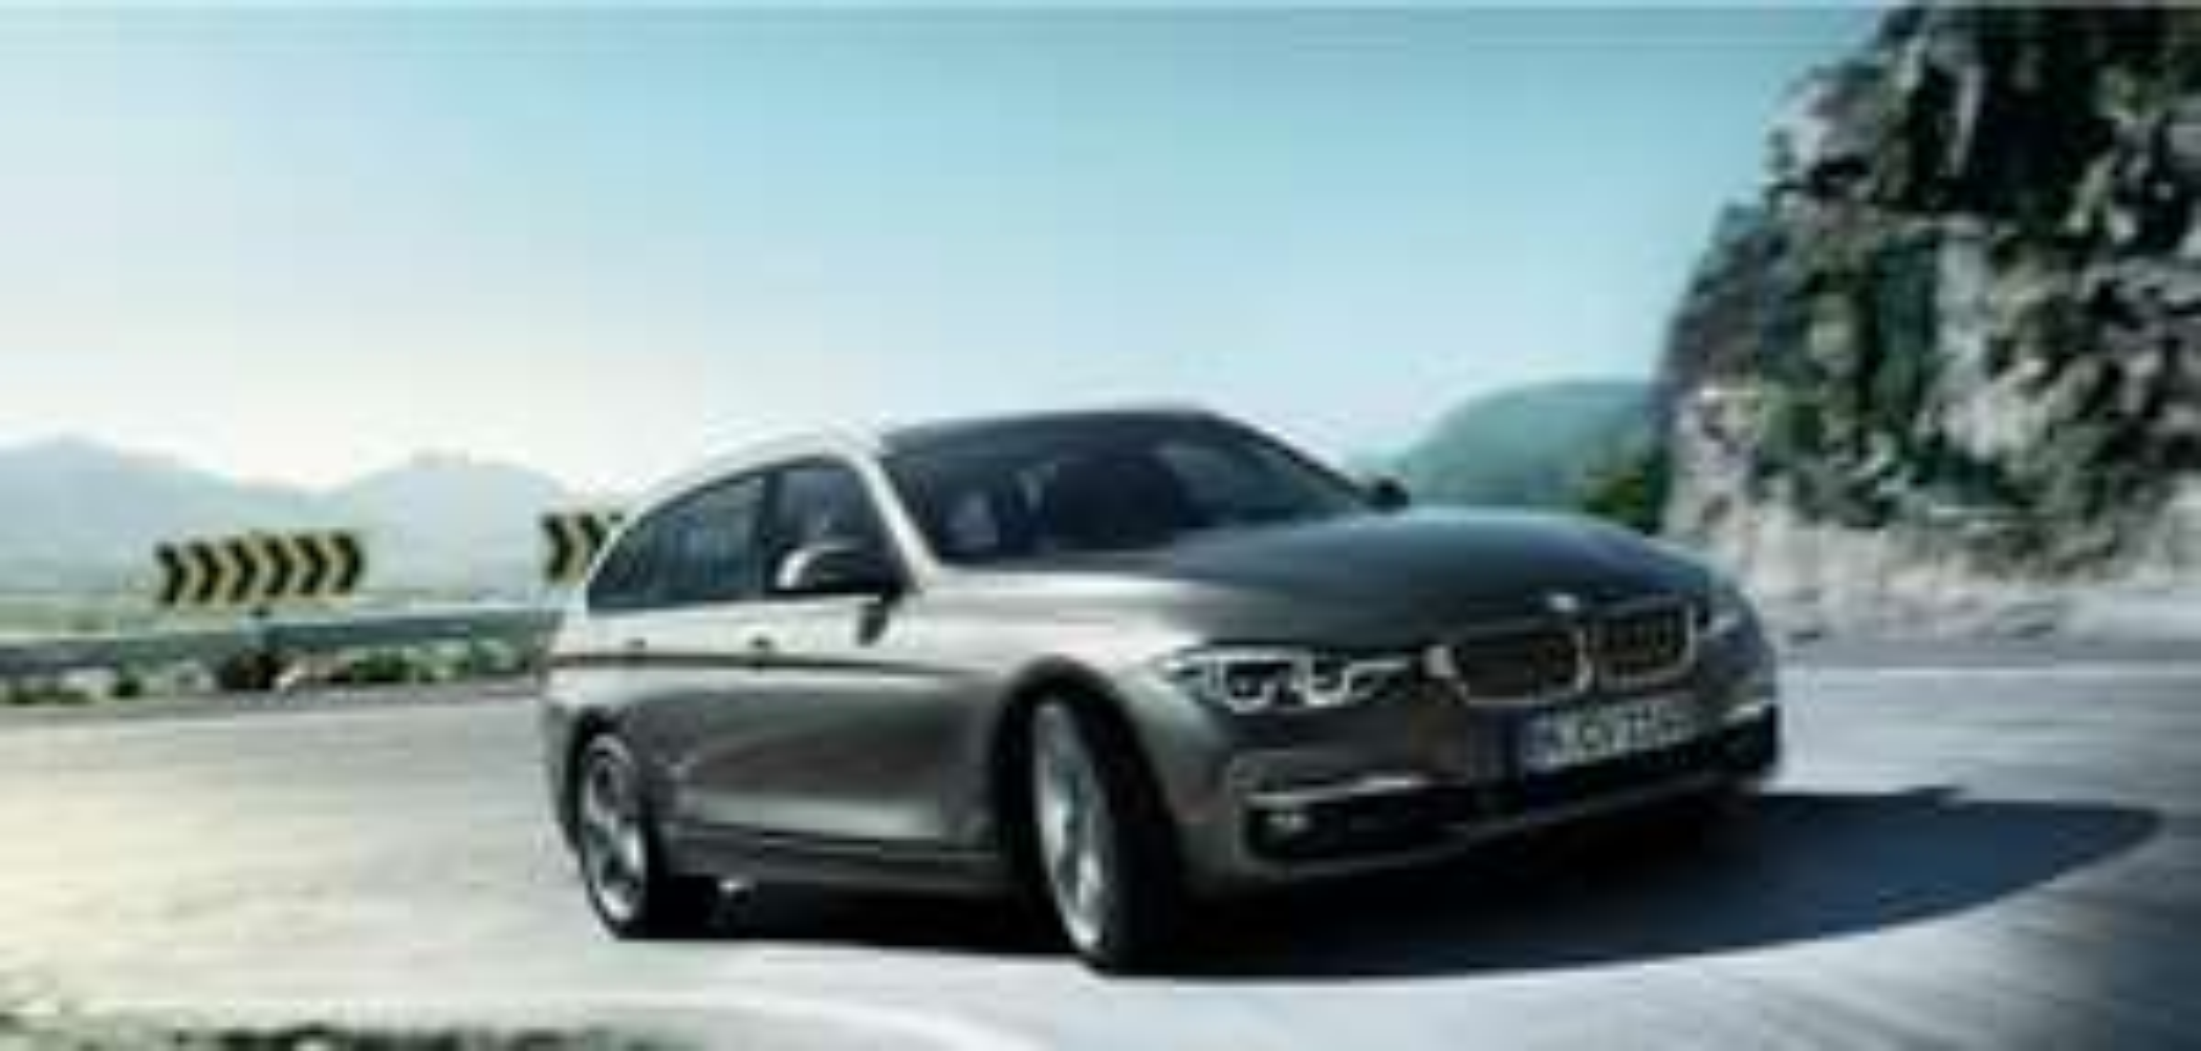 BMW 320i Touring / 184 PS  / 199€ mtl. Rate/ Leasingfaktor 1,02 / 36 Monate Laufzeit / 10.000km pro Jahr/ Modell Advantage / Privatleasing / BMW Niederlassung Kassel